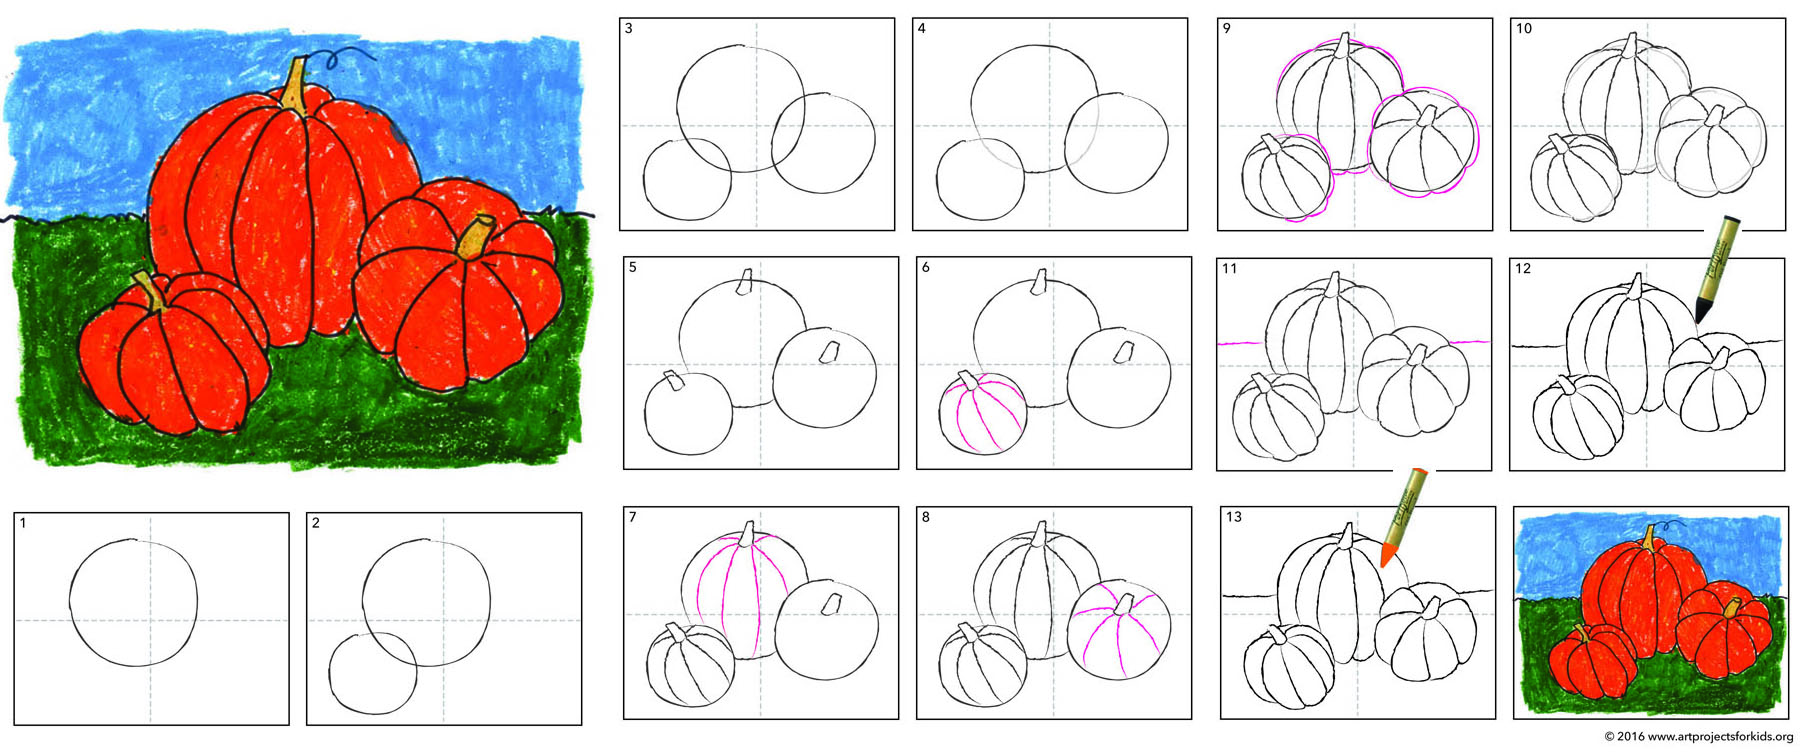 Uncategorized How Do You Draw A Pumpkin pumpkin drawing art projects for kids draw a diagram